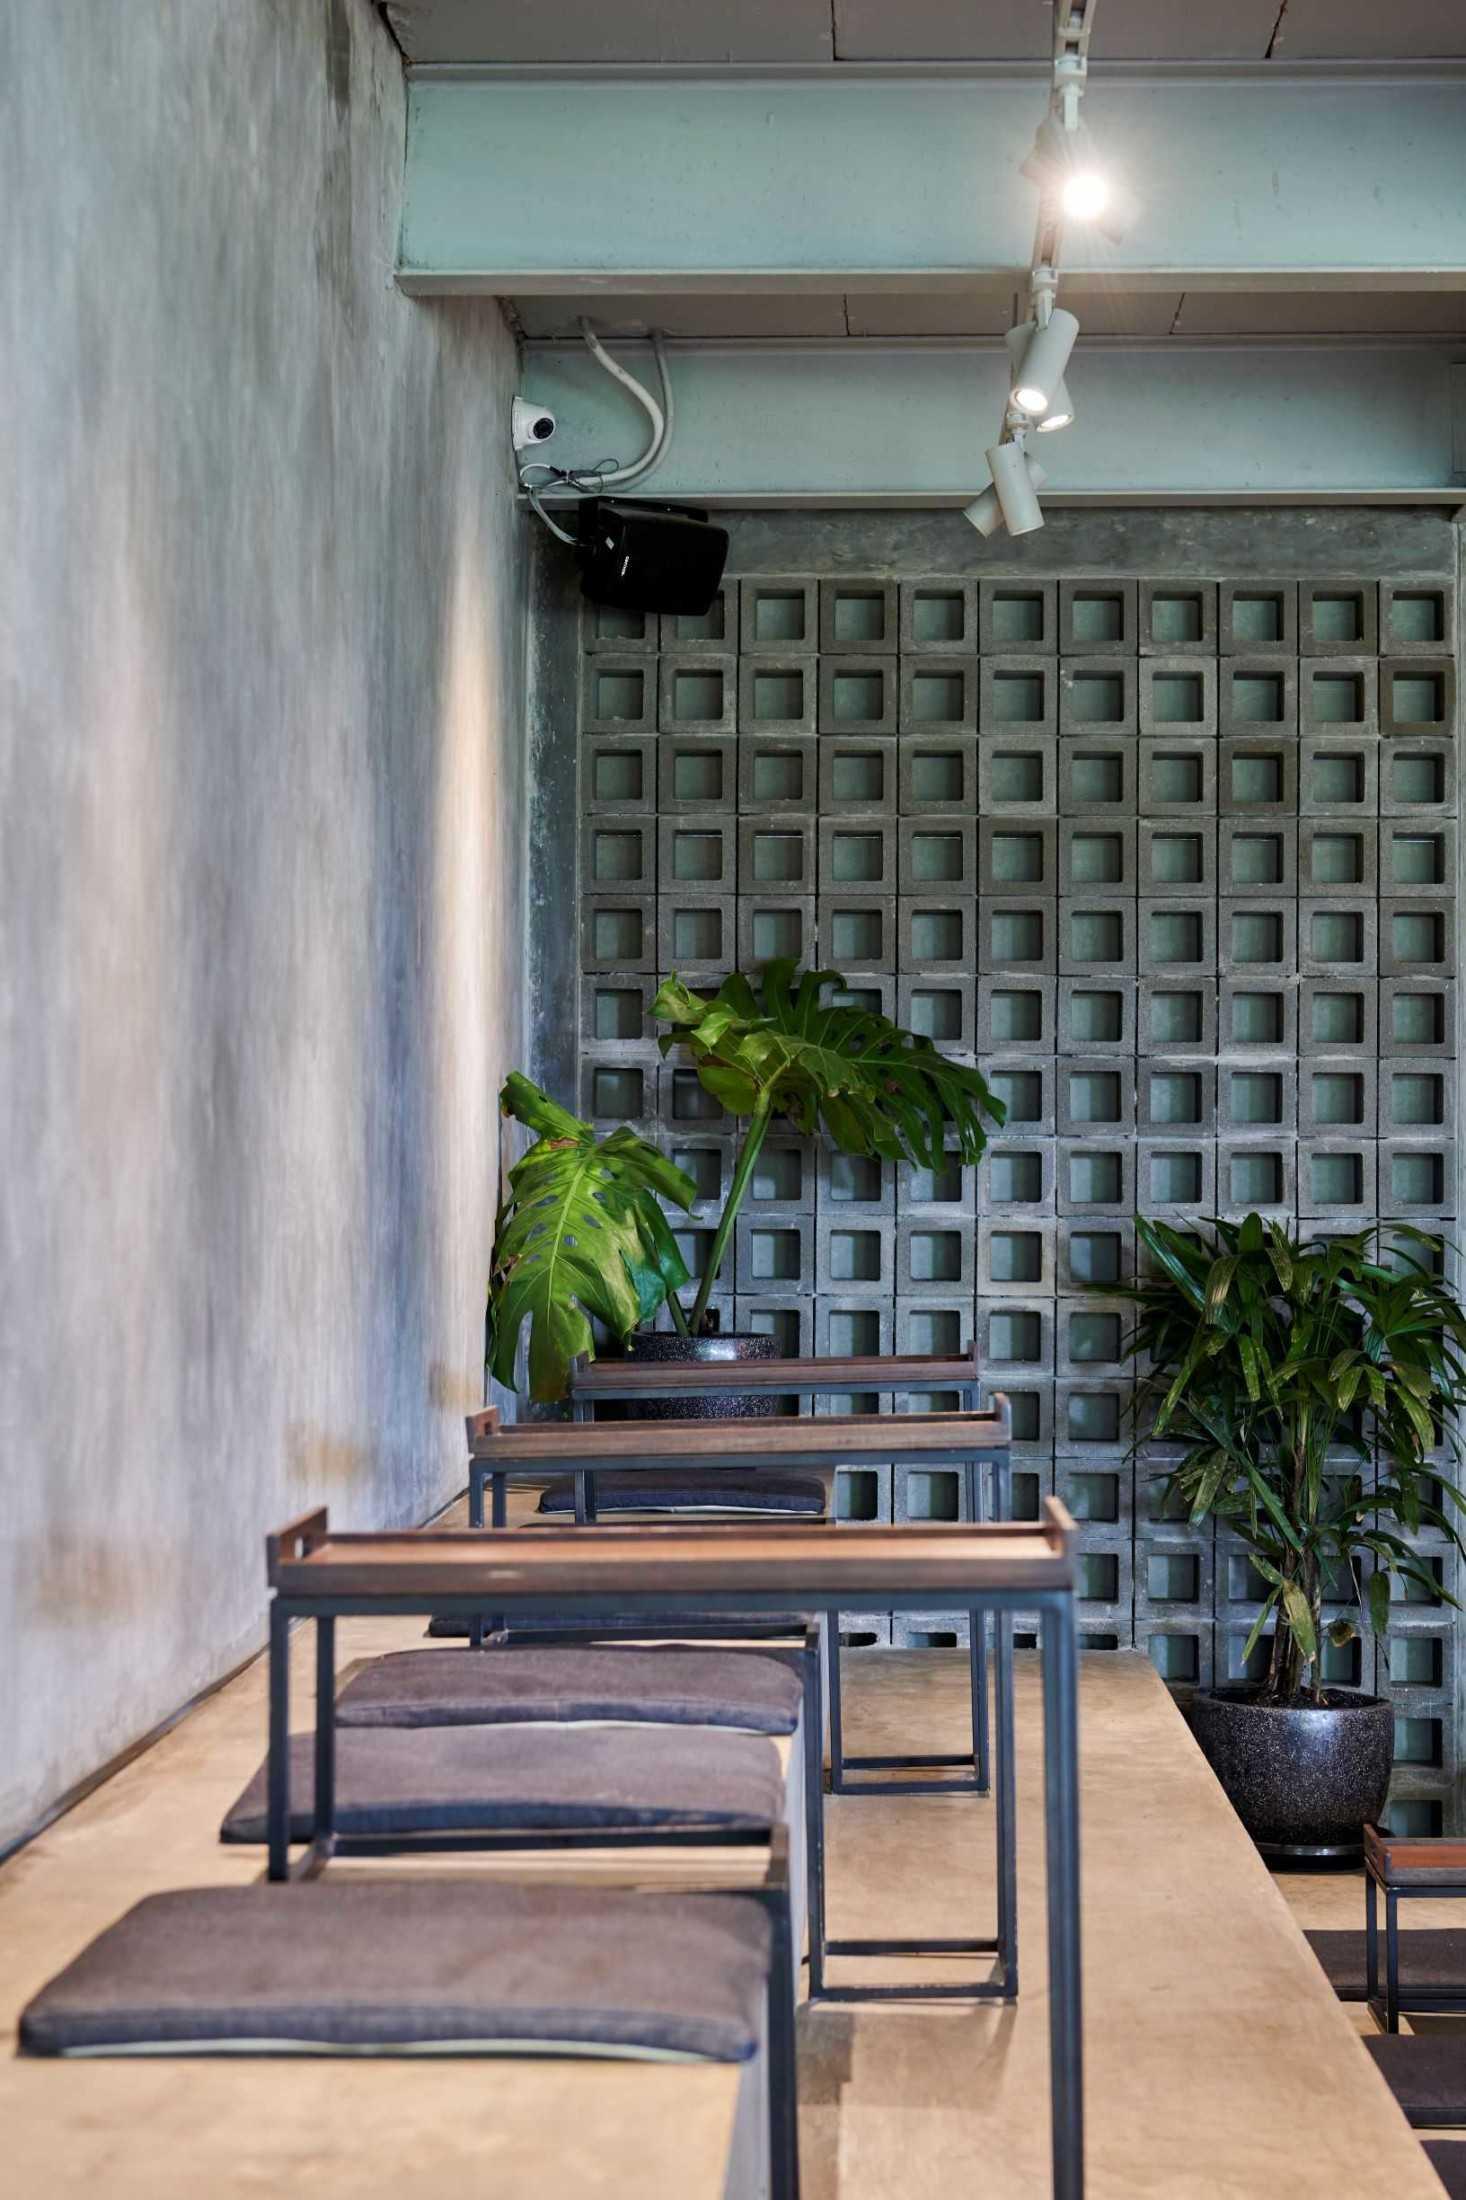 Hadivincent Architects Oval Bar Ciumbuleuit, Cidadap, Kota Bandung, Jawa Barat, Indonesia Ciumbuleuit, Cidadap, Kota Bandung, Jawa Barat, Indonesia Hadivincent-Architects-Oval-Bar  71523